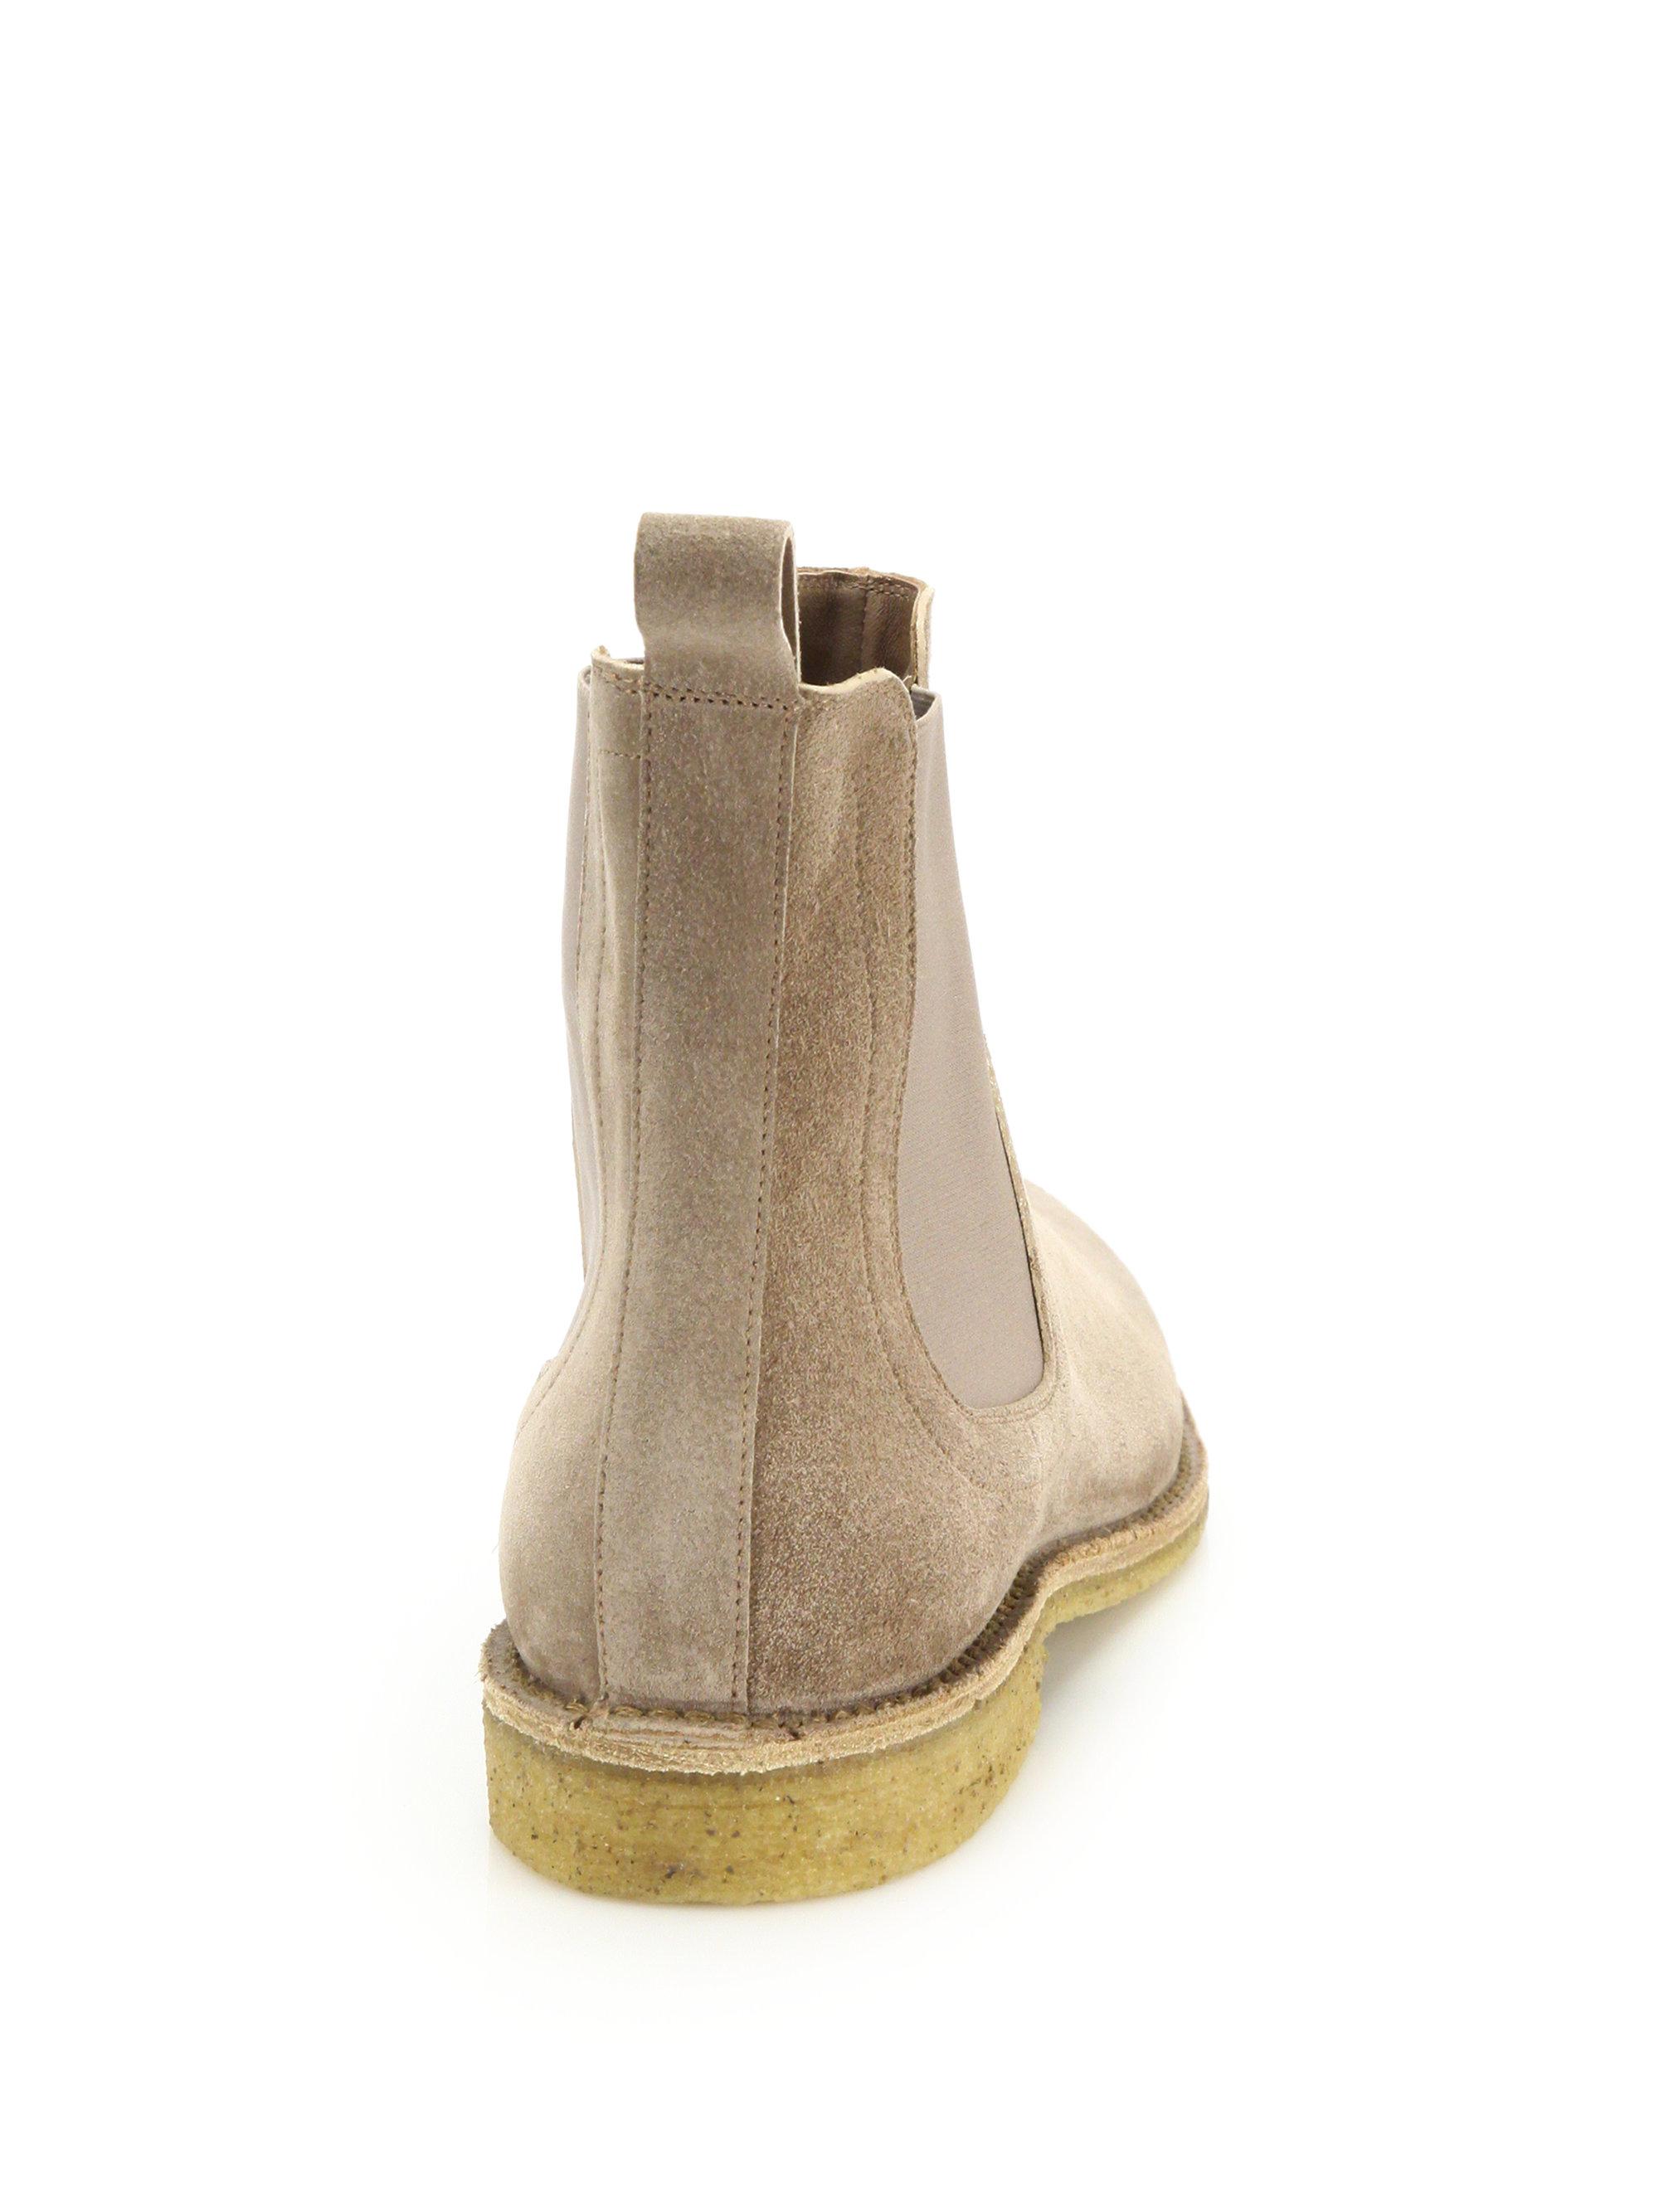 Brilliant Bottega Veneta Suede Chelsea Boots In Gray For Men  Lyst